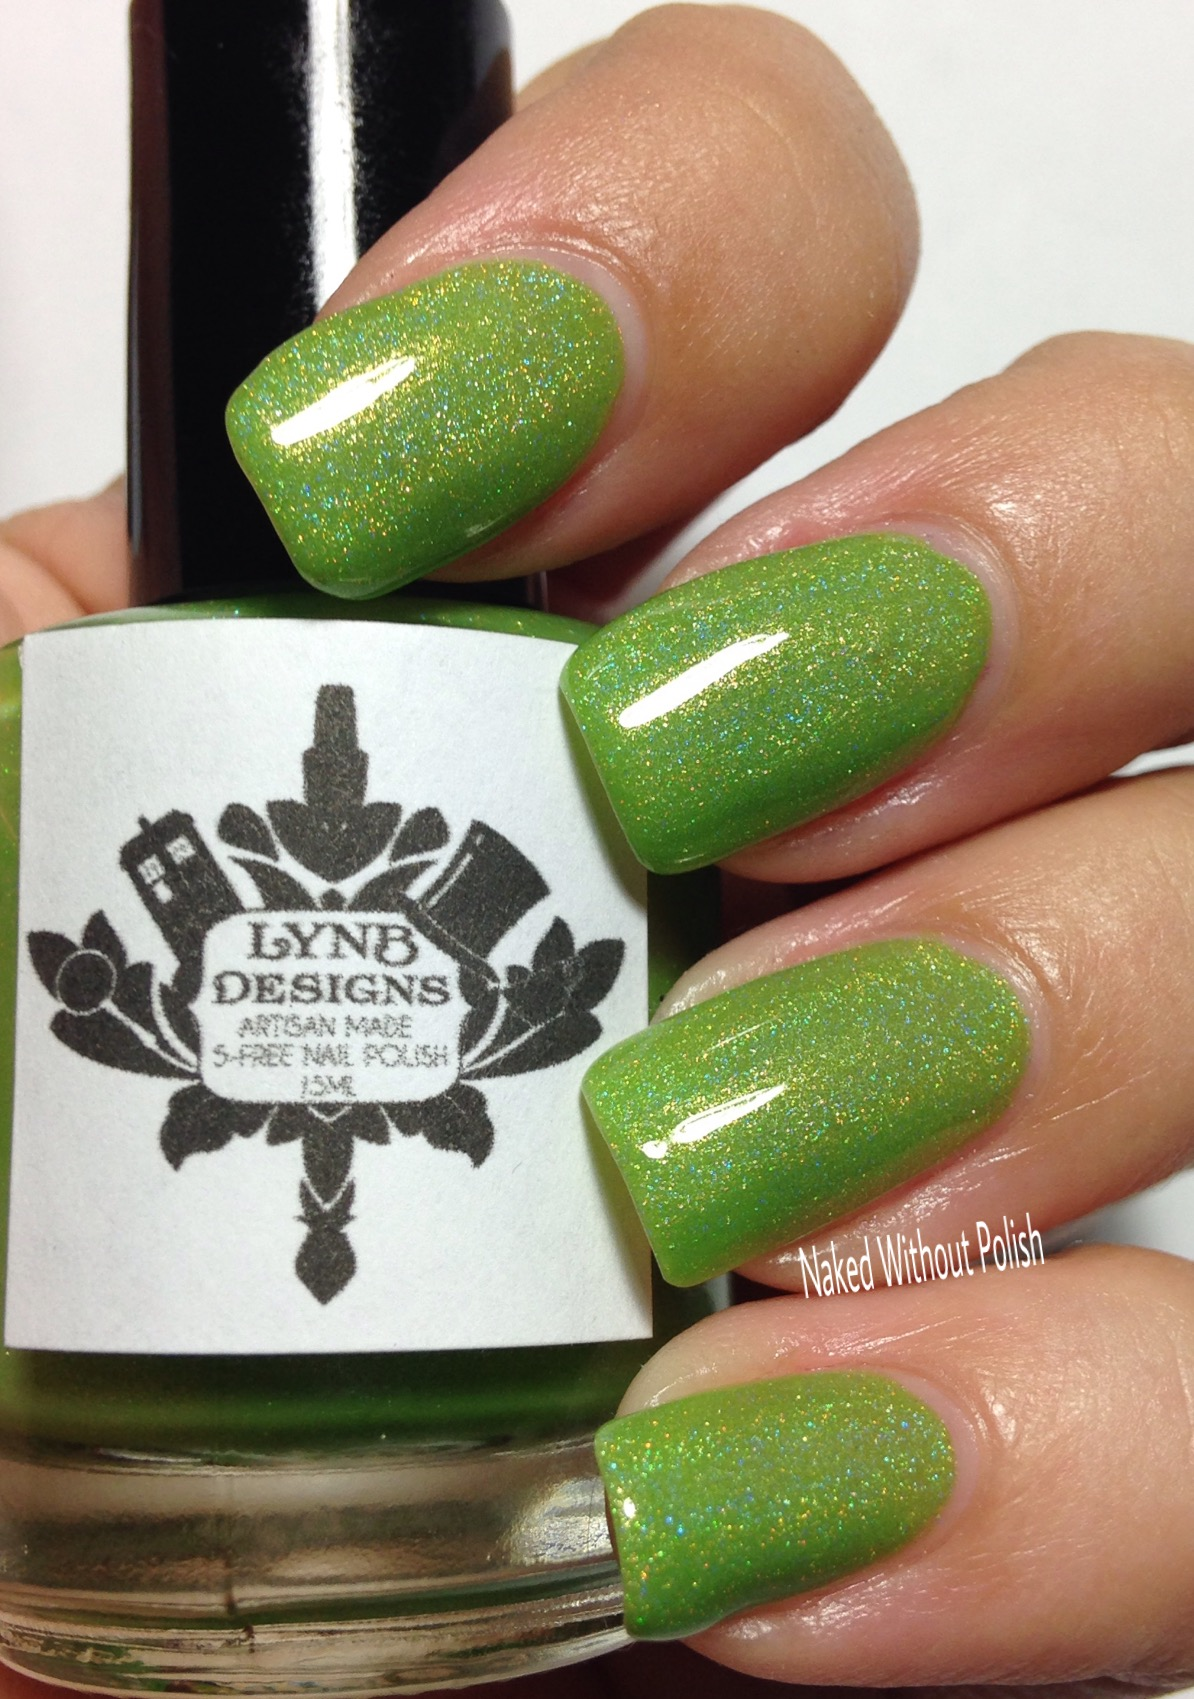 LynBDesigns-Lime-and-Lime-Again-11